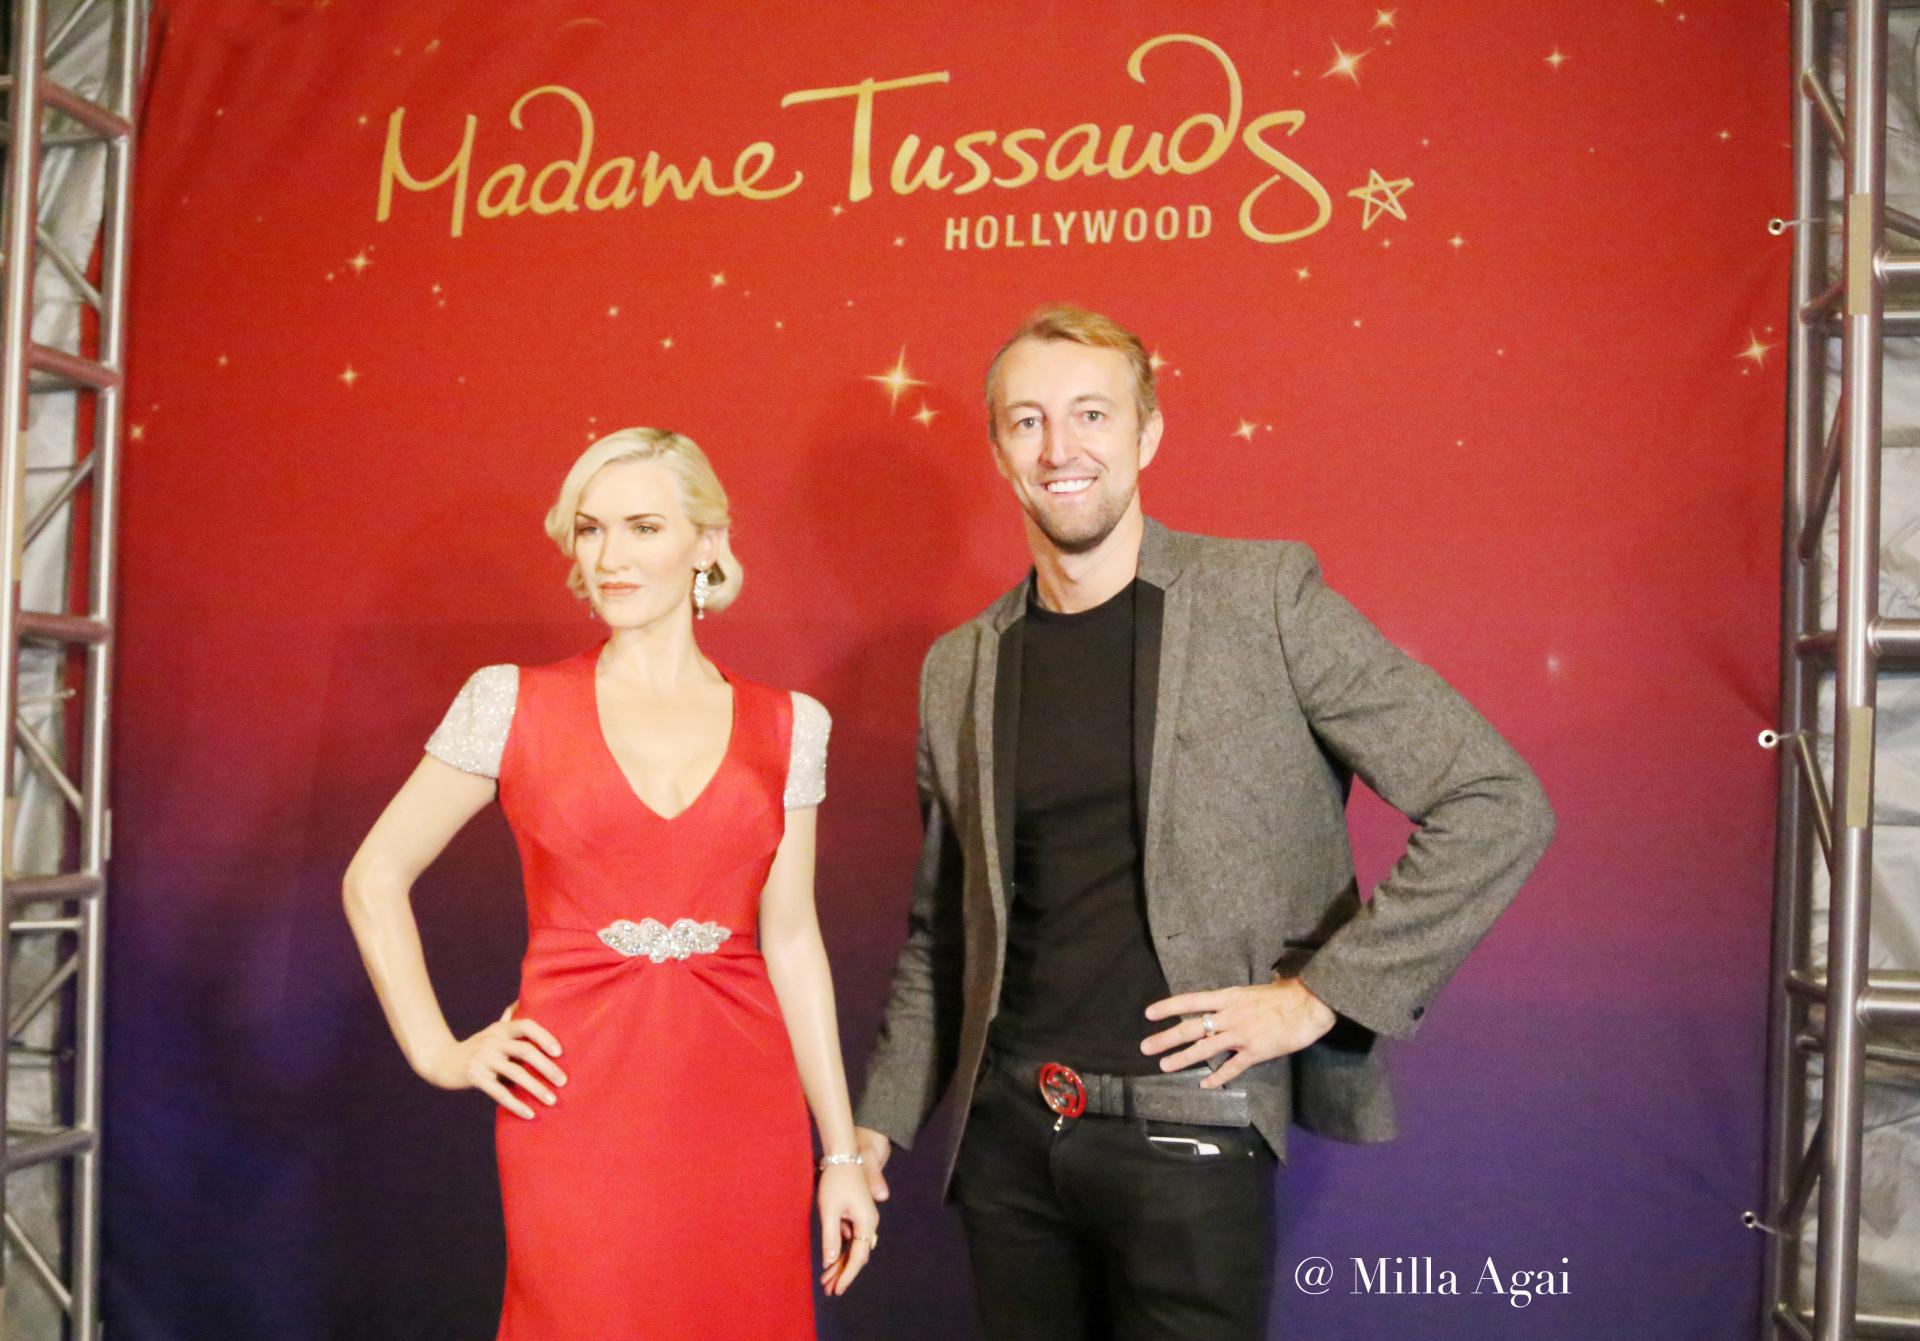 Mario-Max Prinz Zu Schaumburg-Lippe at Kate Winslet's Wax Figure at Madame Tussauds.